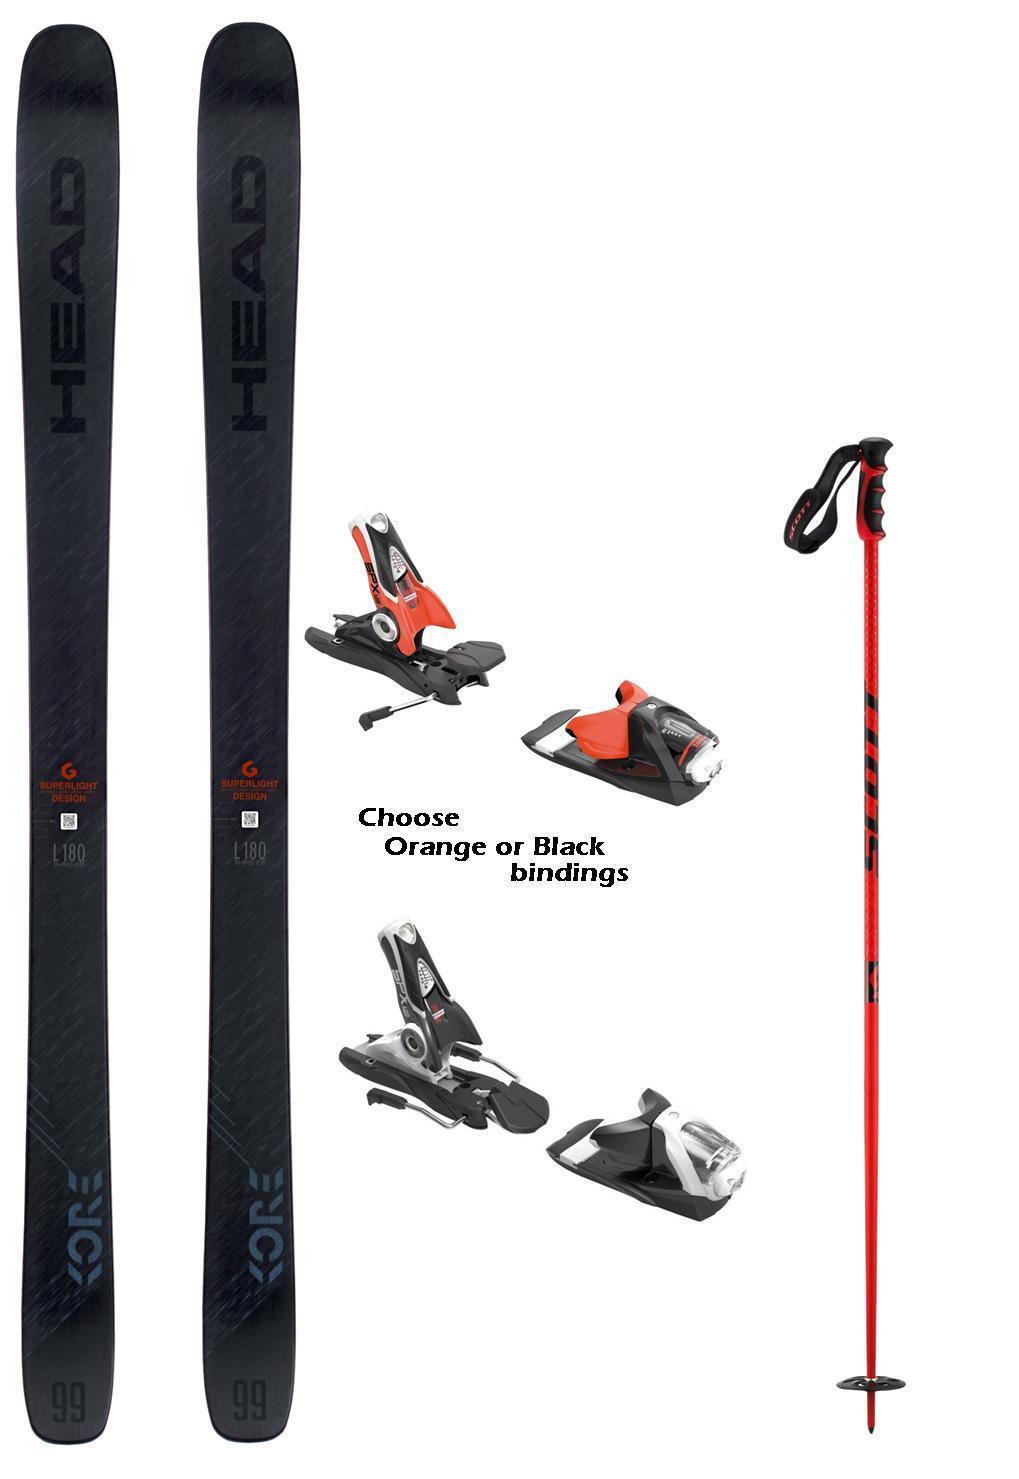 HEAD Kore 99 snow skis 171cm w-bindings (incl POLES at Buy It Now) NEW 2019